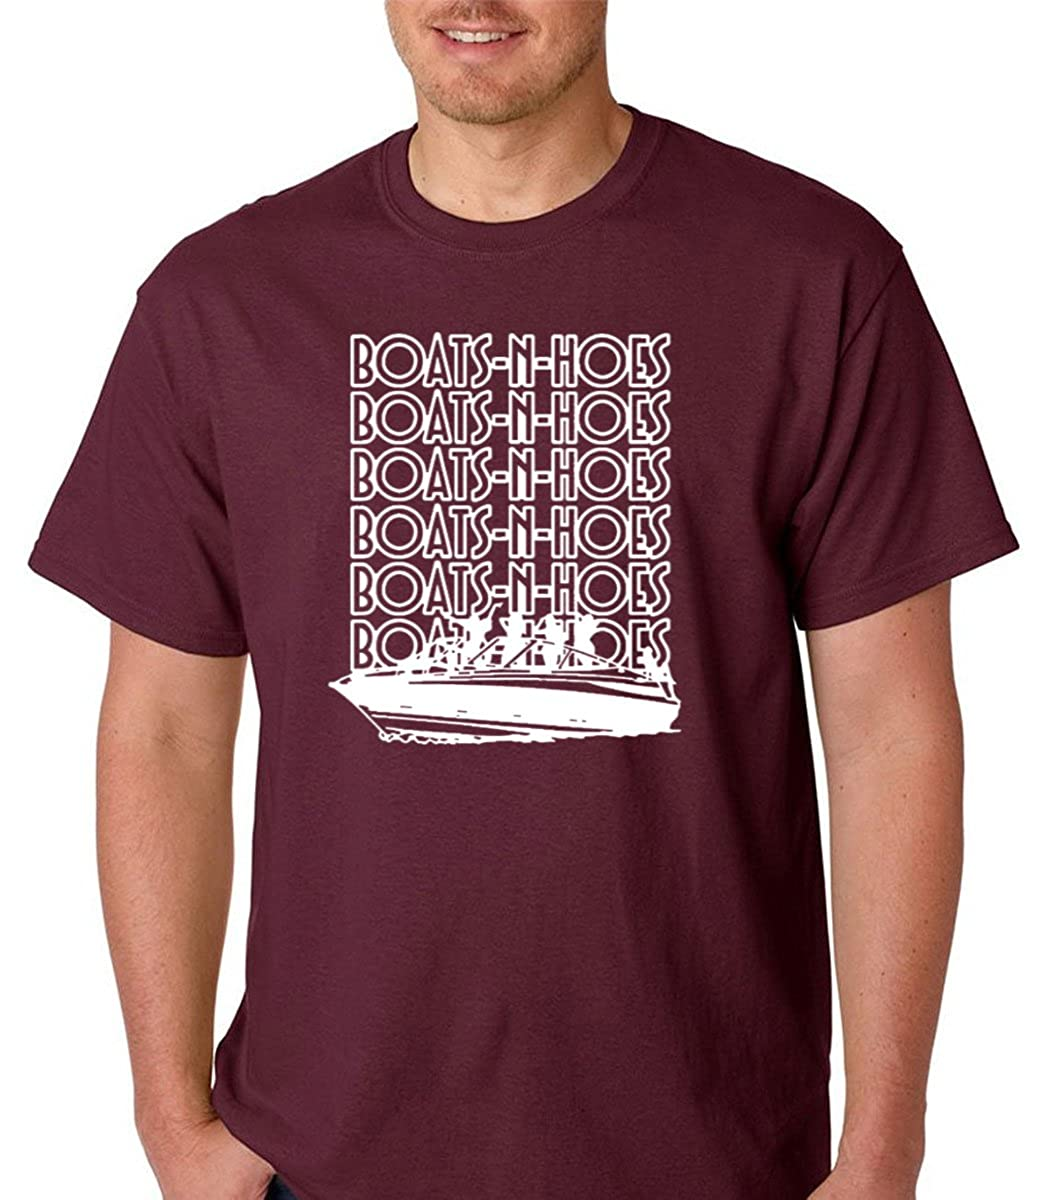 f4fe5282 Amazon.com: Raw T-Shirts Boats and Hoes Prestige Worldwide - Funny Boats  Premium Men's T-Shirt: Clothing